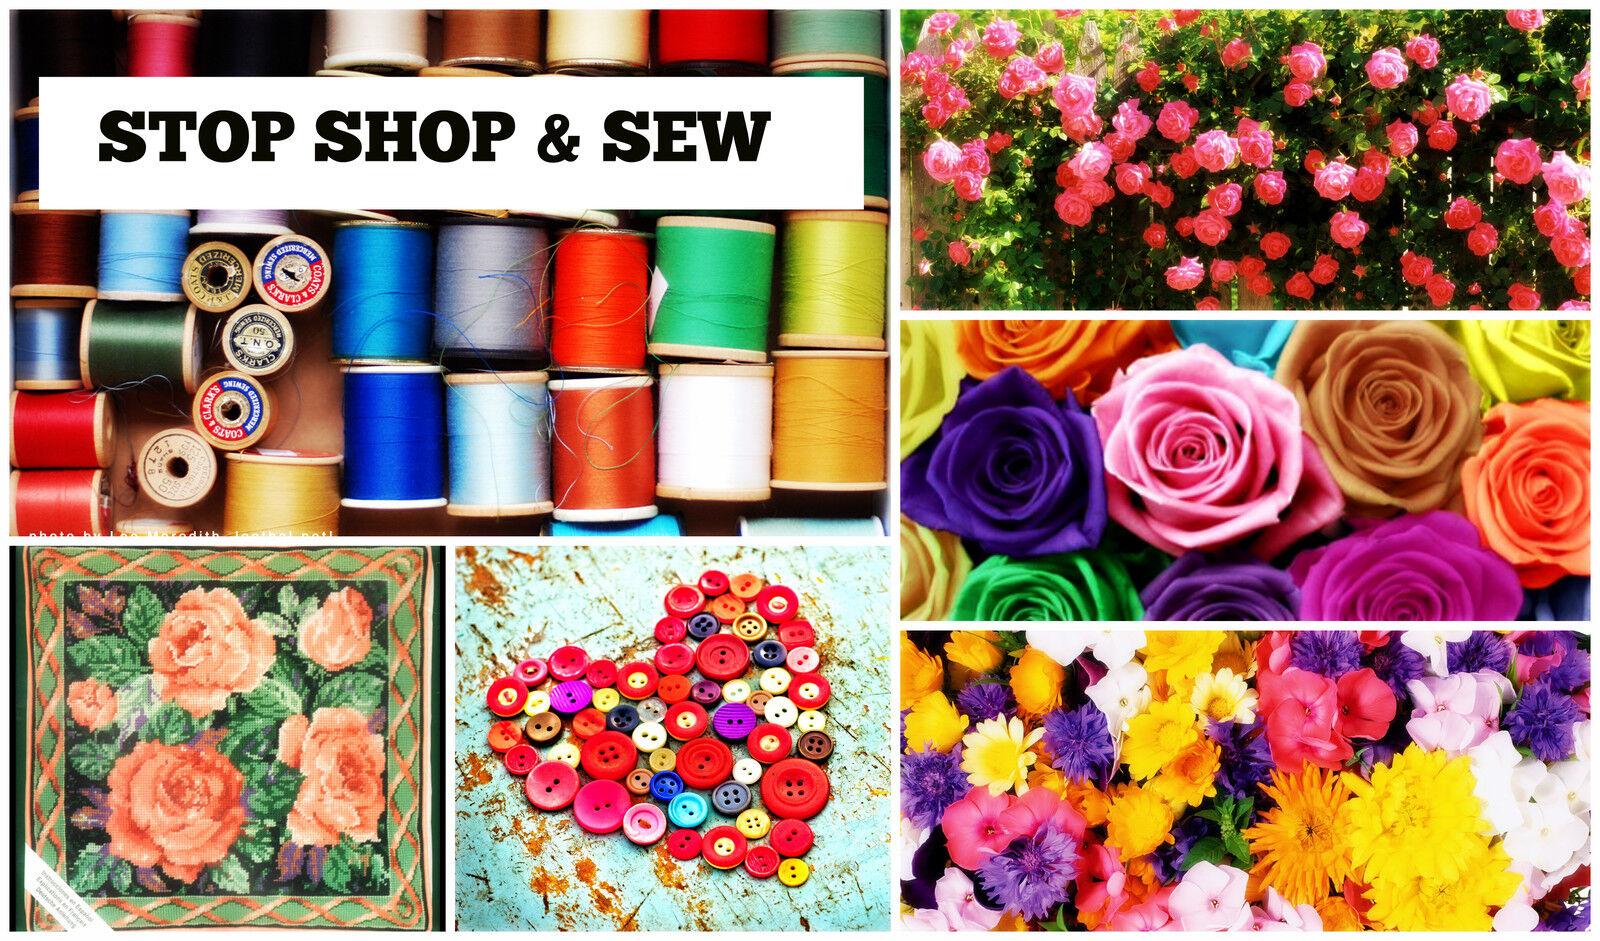 Stop Shop Sew